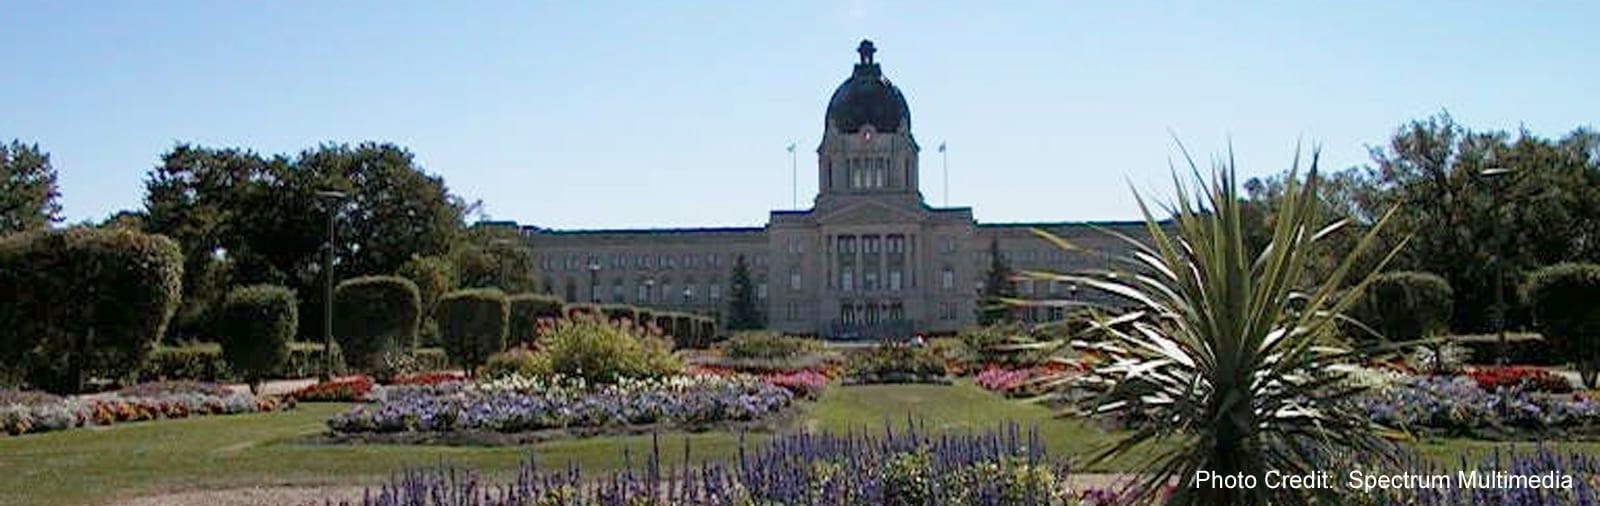 Regina- Saskatewan Legislature with flowers - sliver (Spectrum Multimedia)